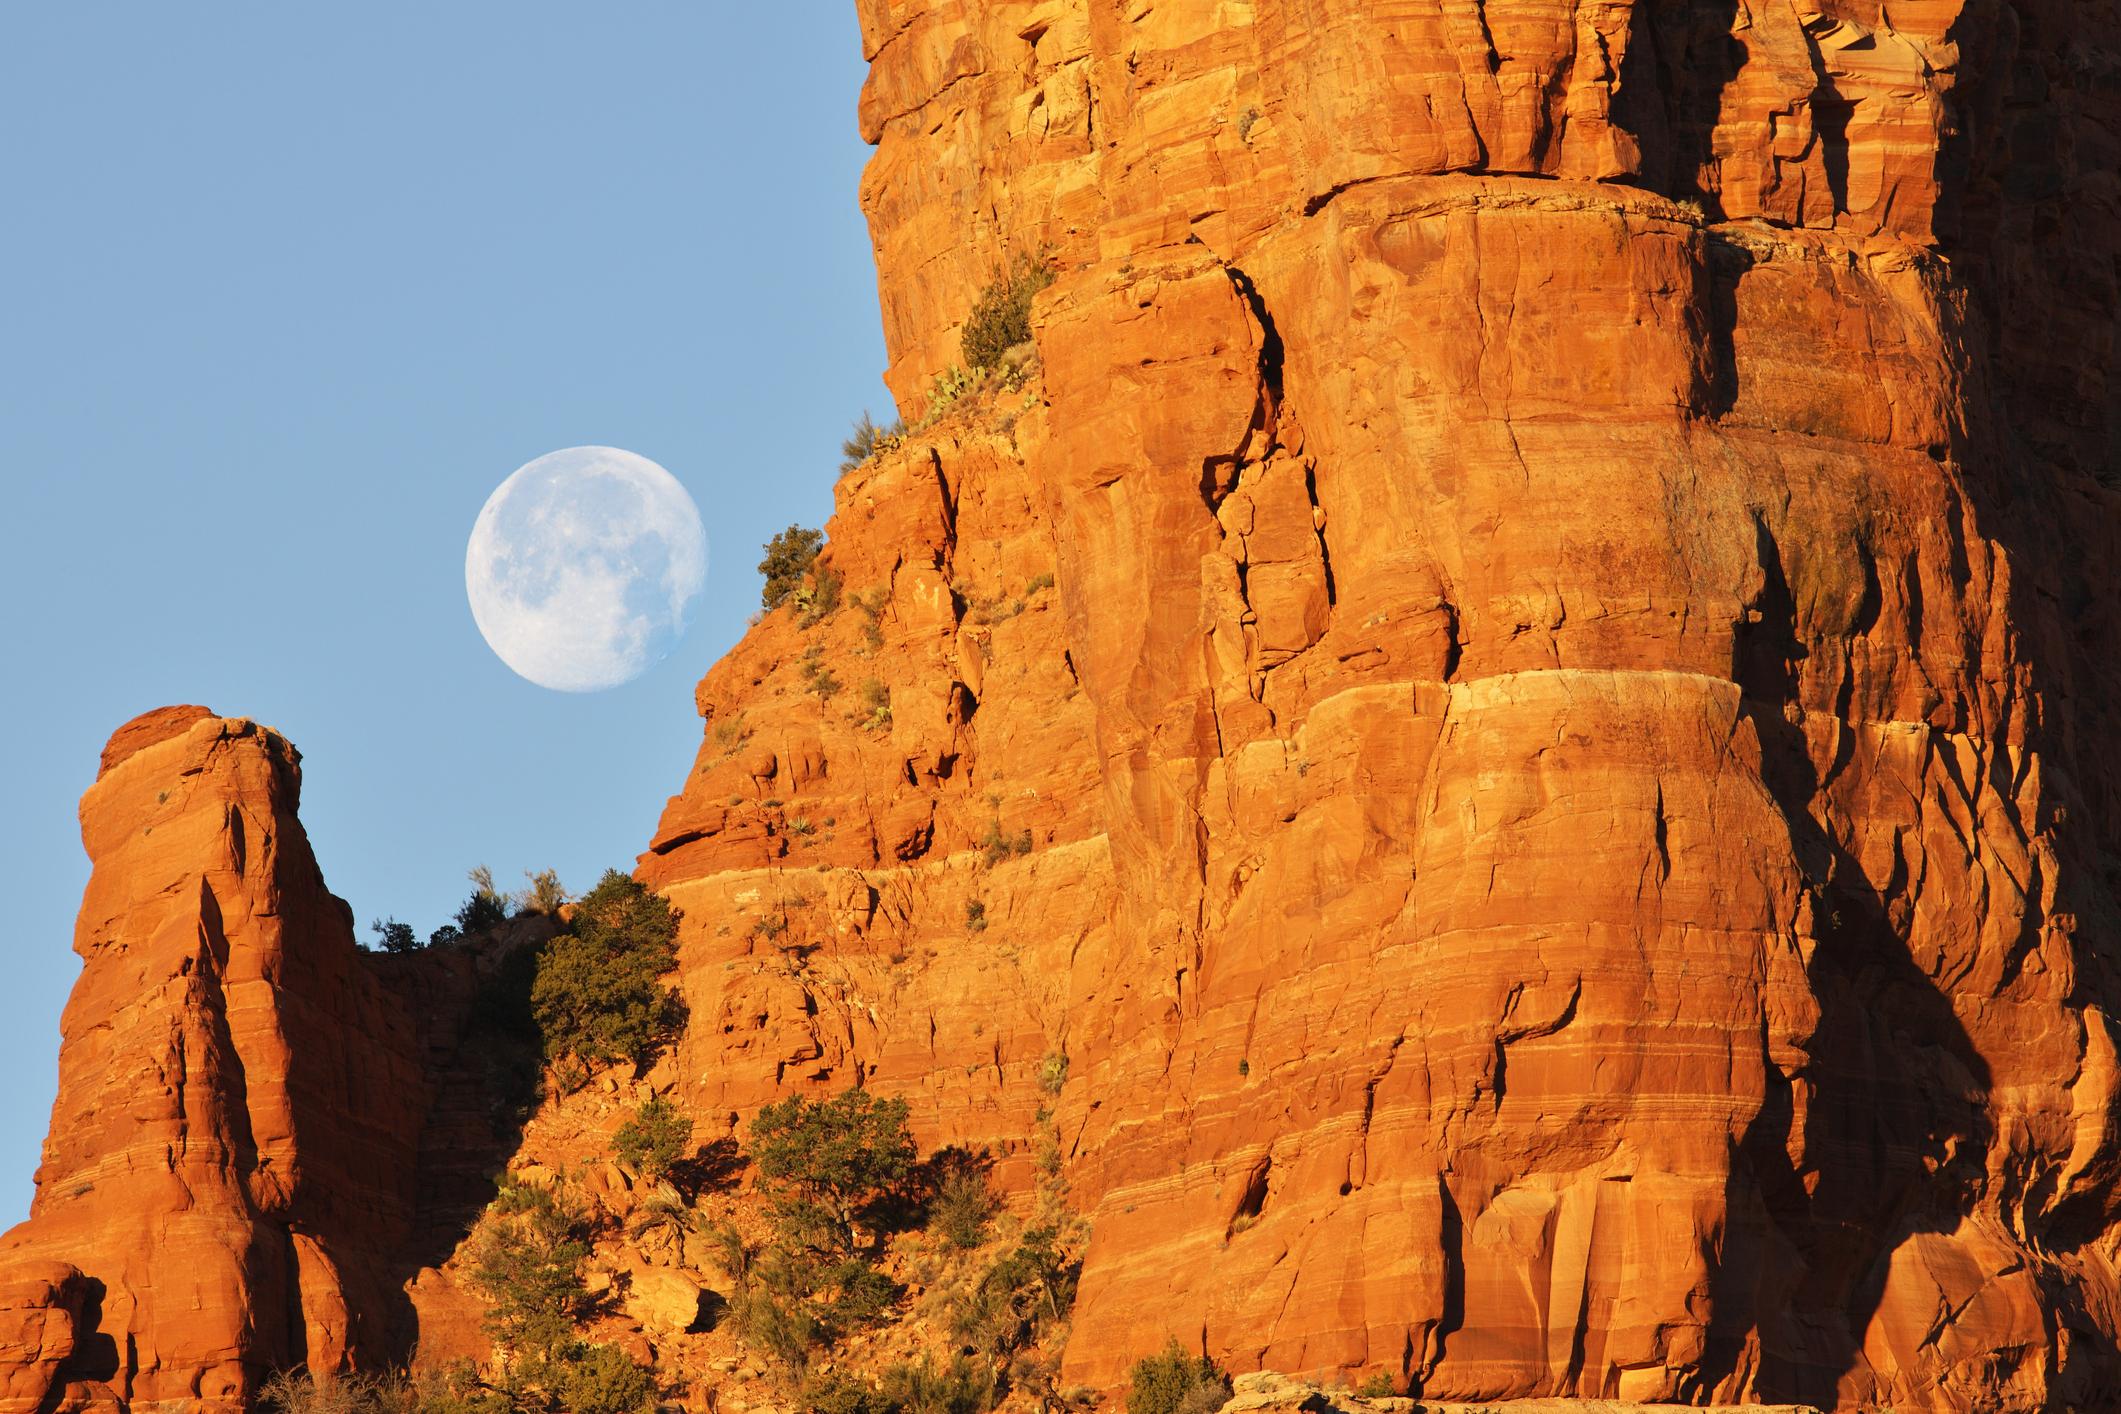 Full moon descends behind red rock desert butte as morning sun rises.